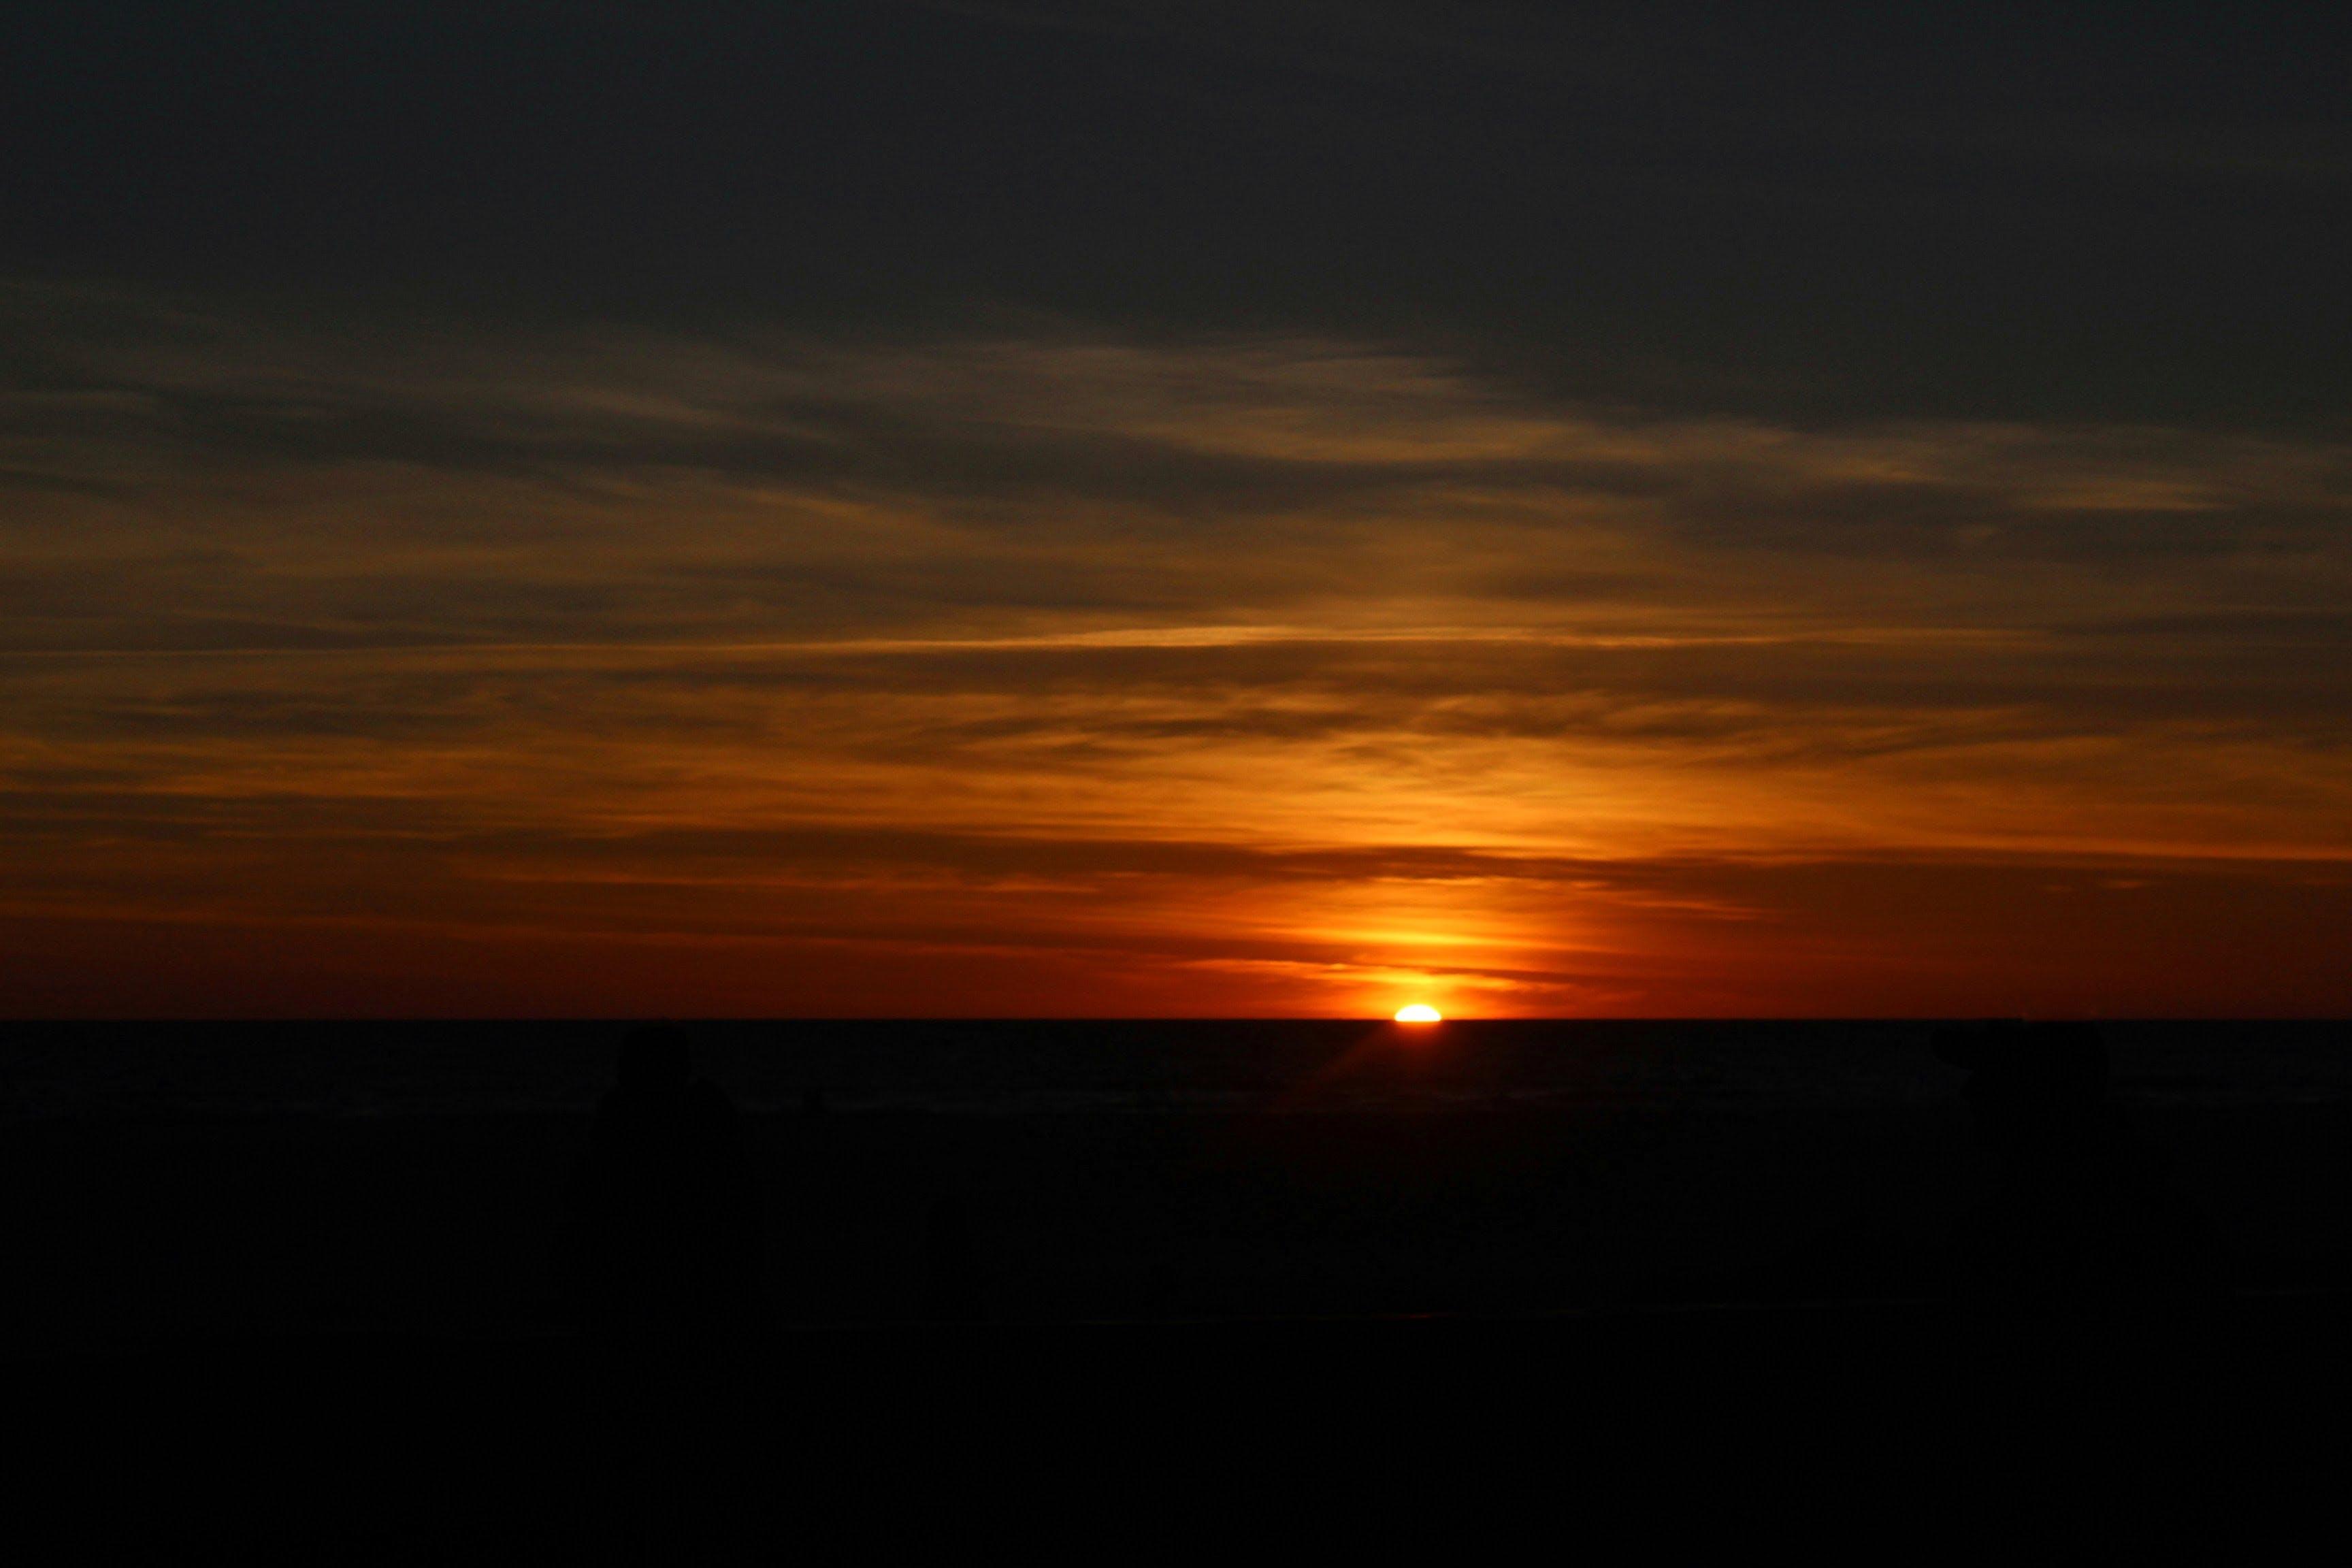 Landscape Photo of Golden Hour